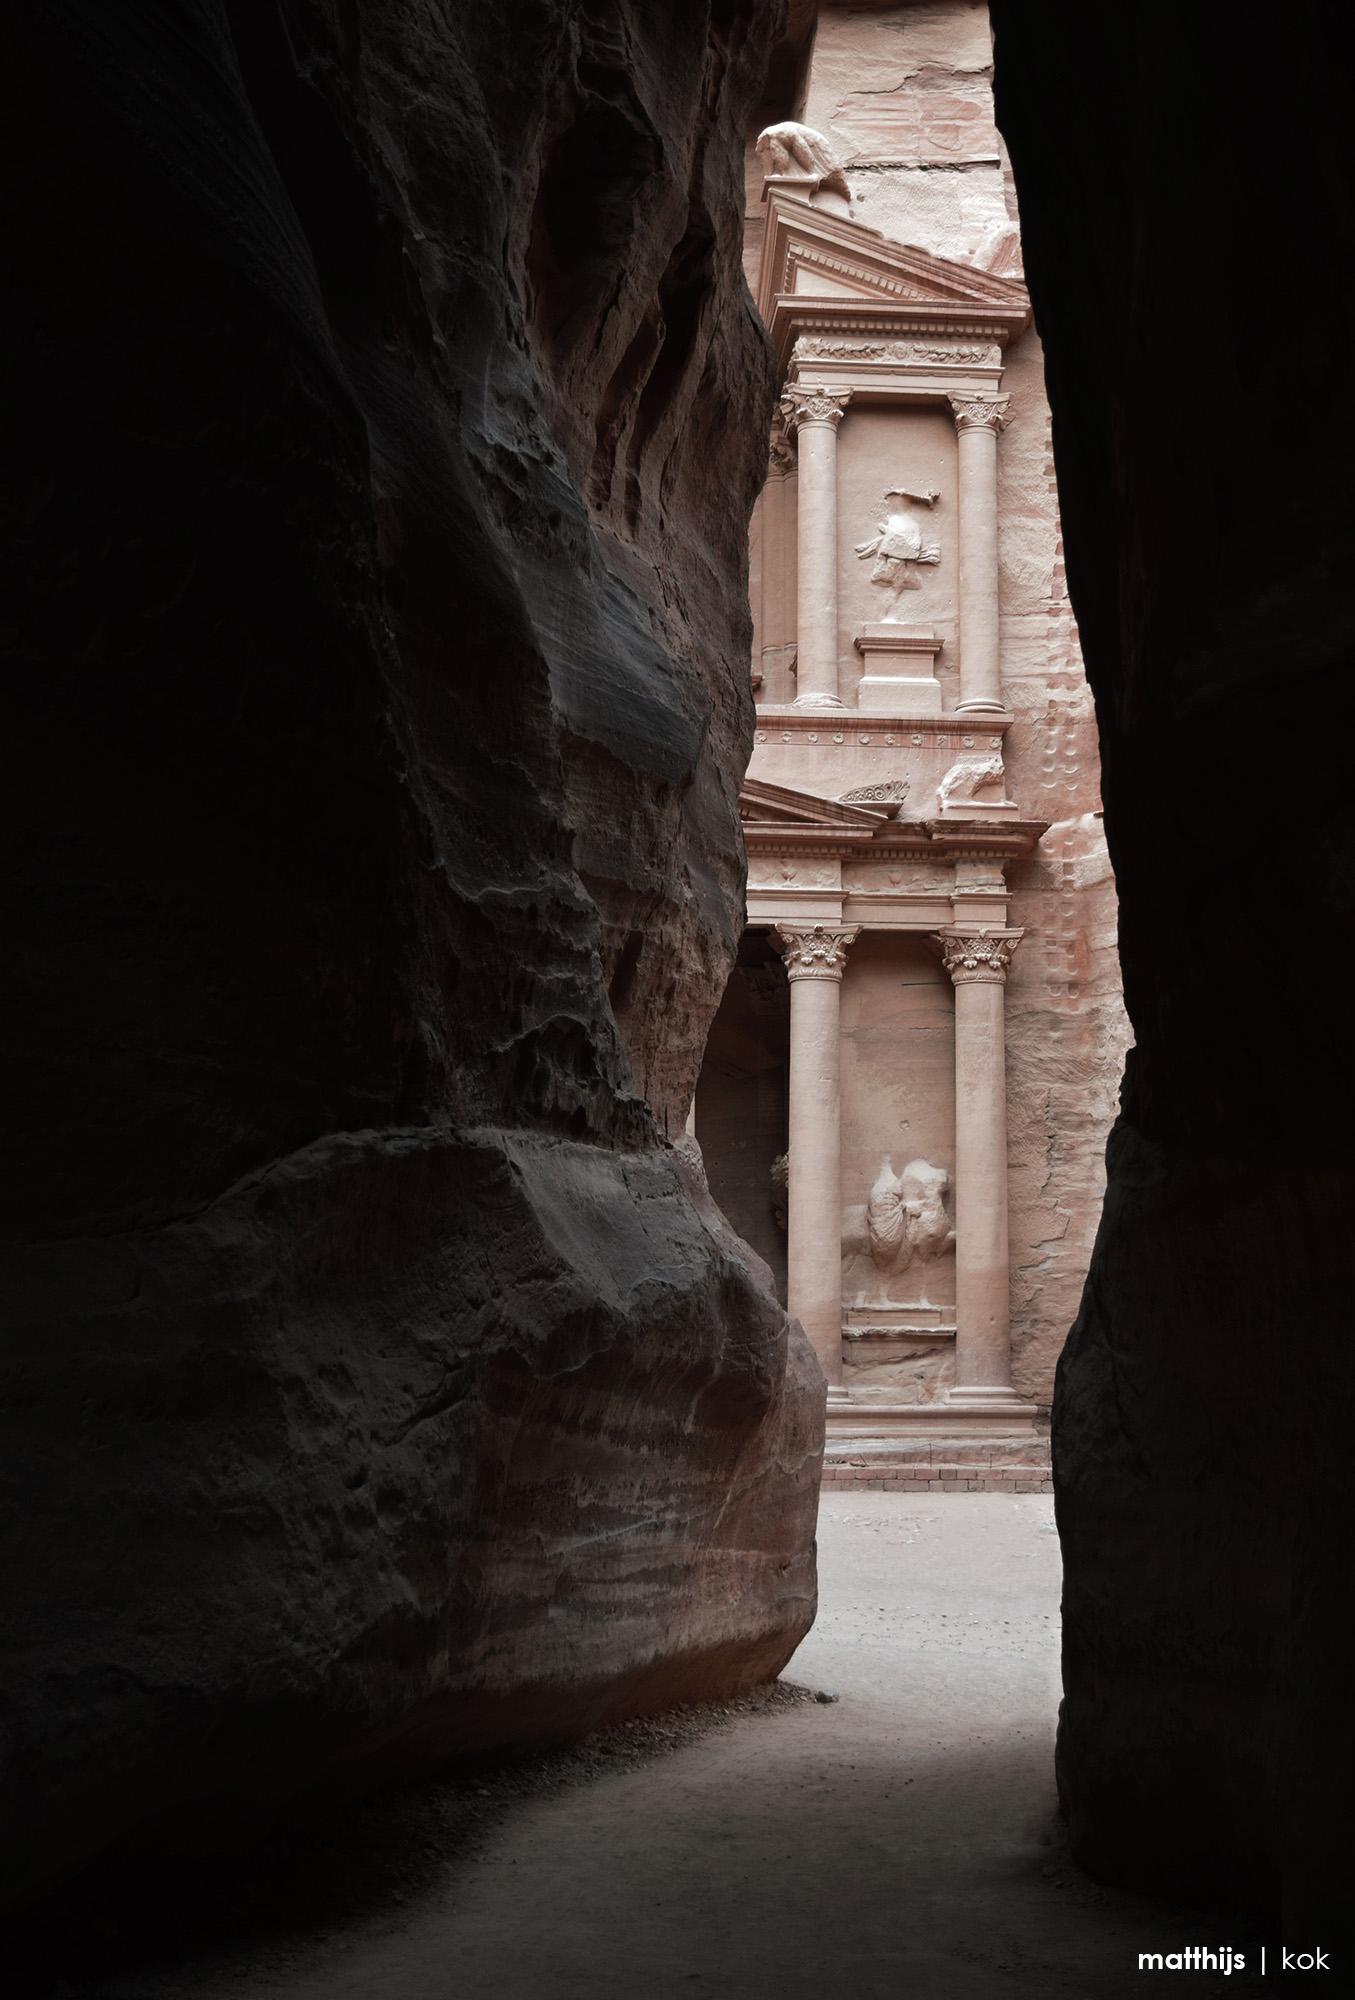 Siq, Petra, Jordan | Photography by Matthijs Kok